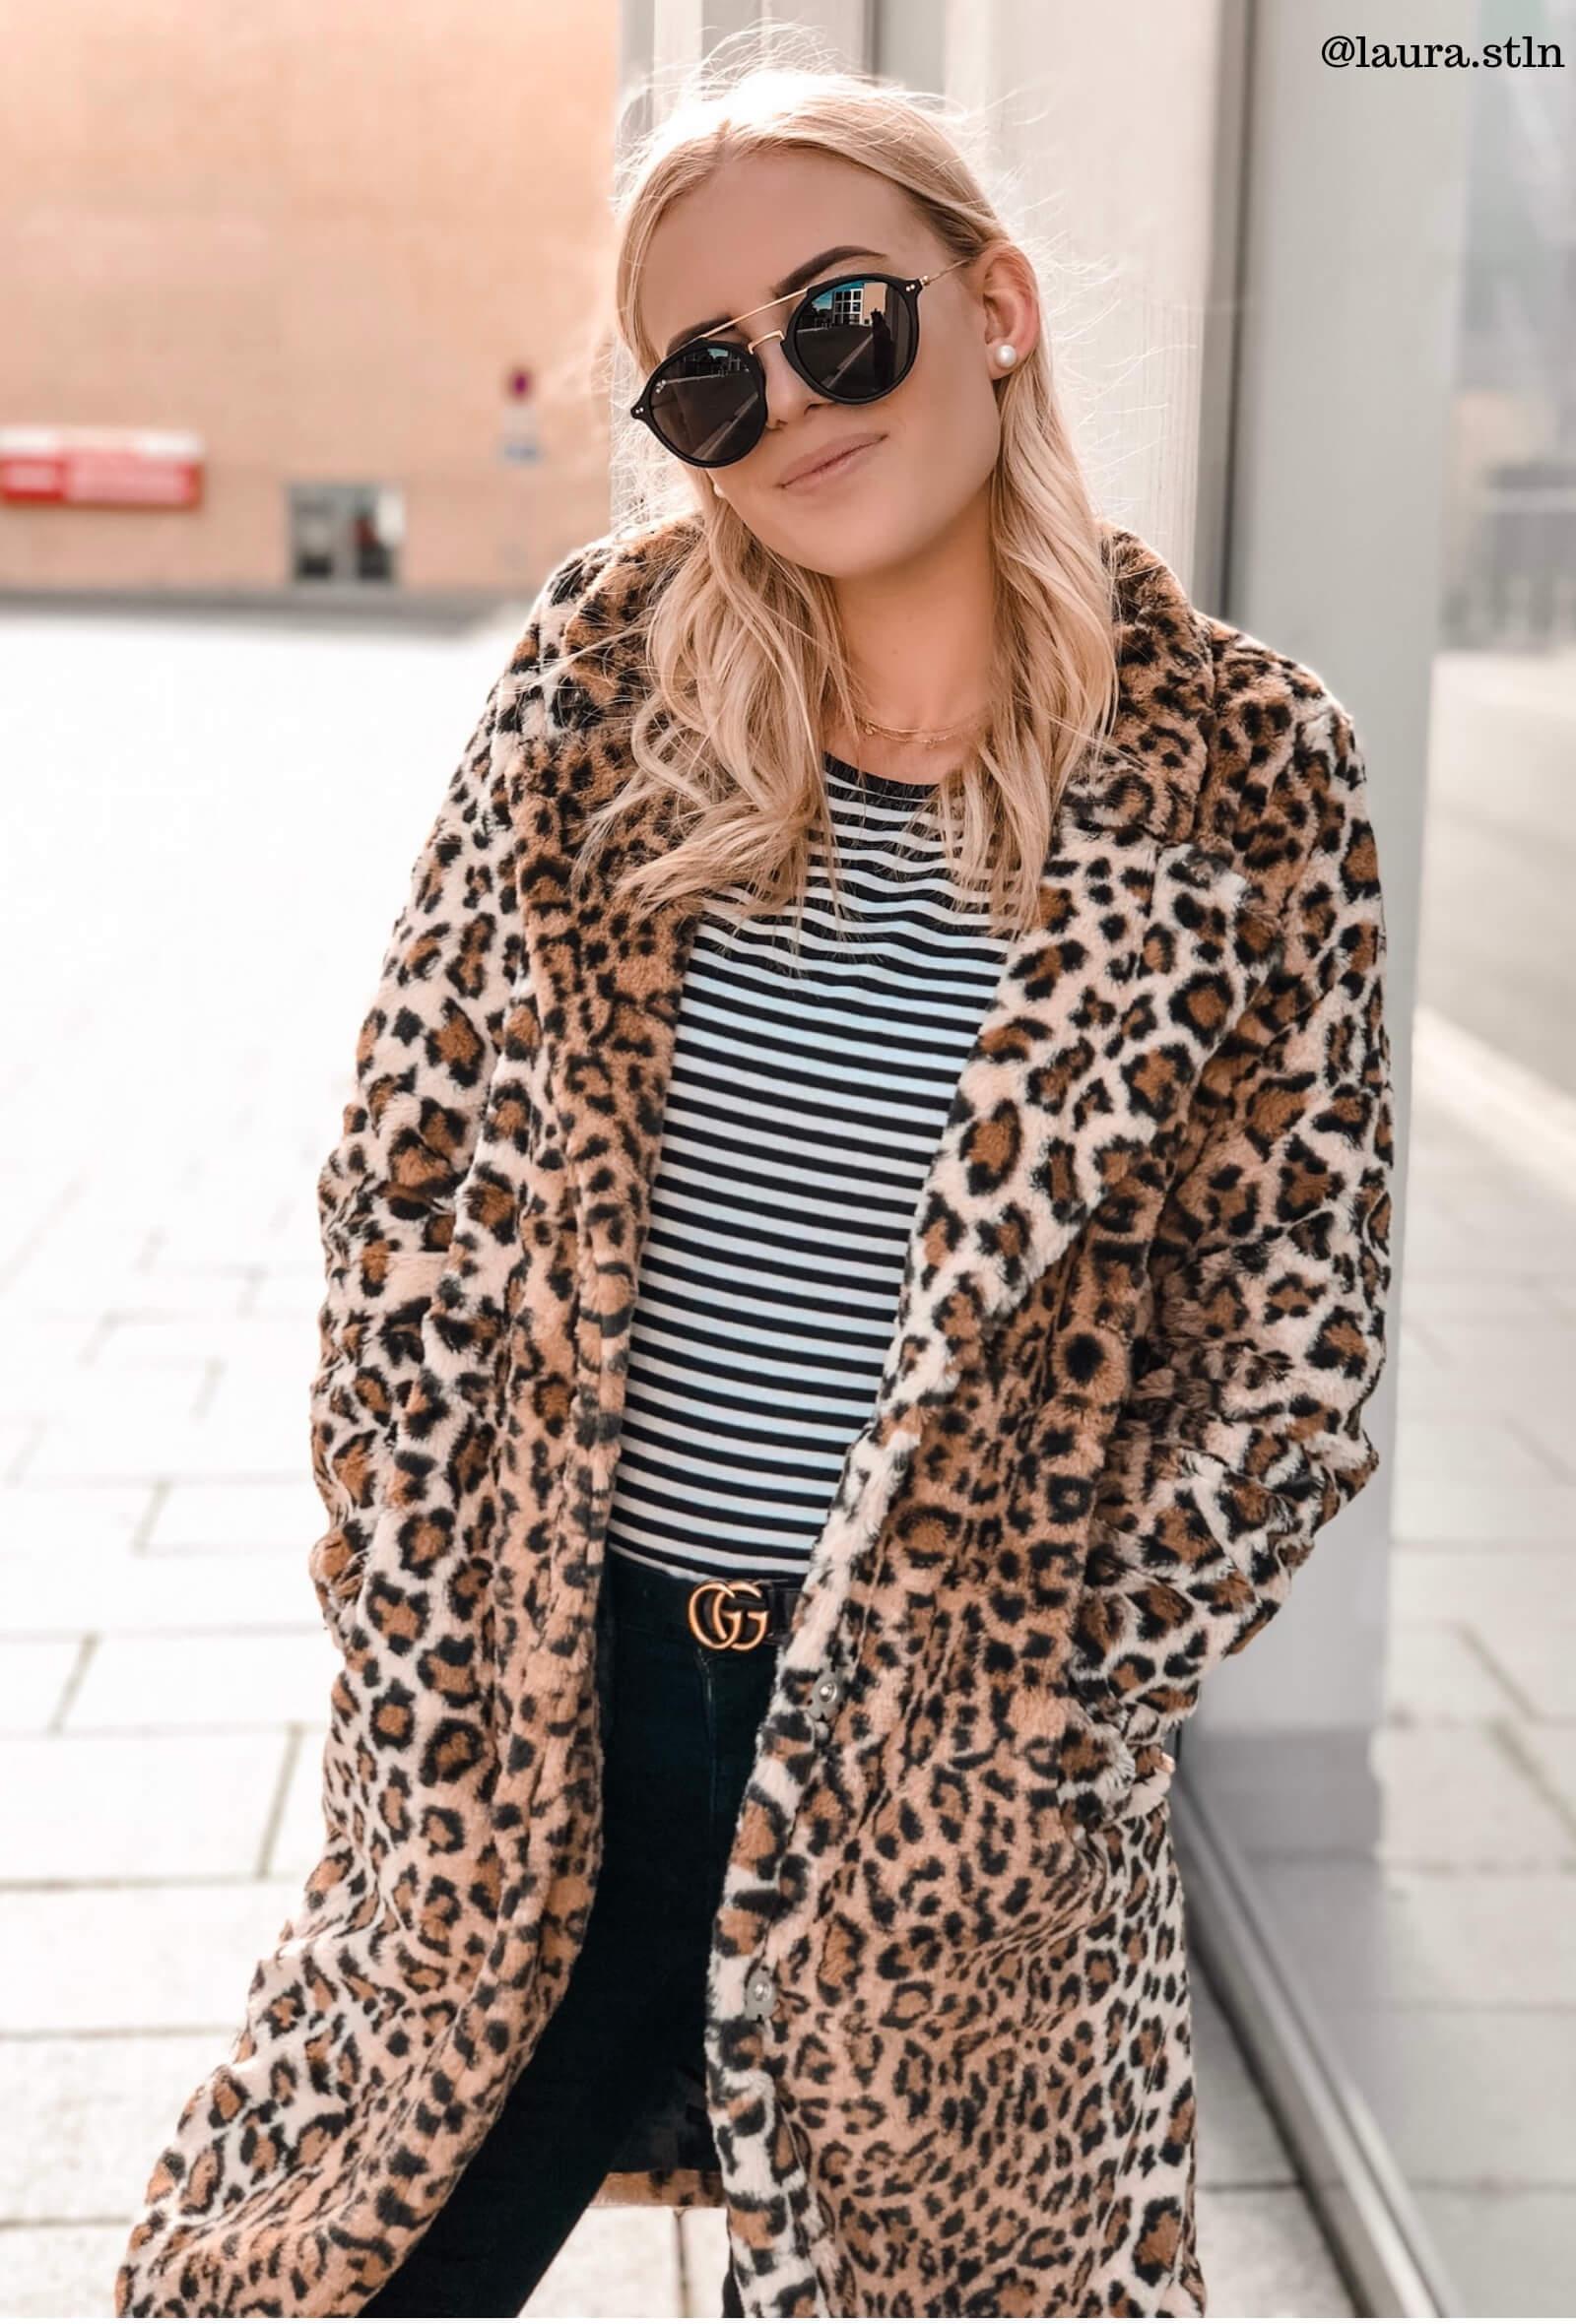 Blogger Look im Mantel mit Leoparden-Muster